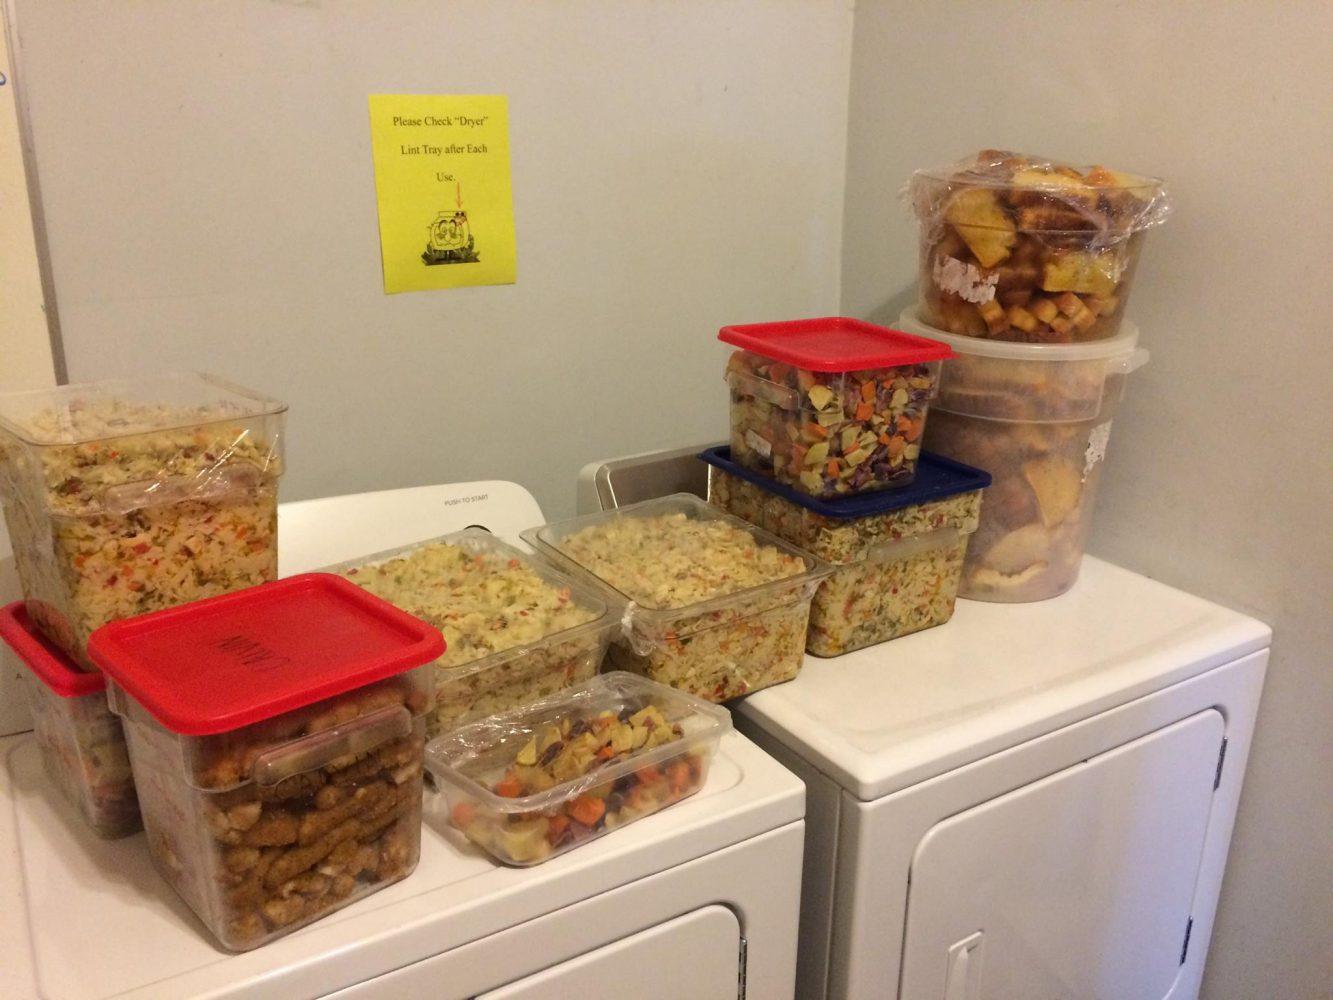 Food Recovery Network saves 217 lbs of food. Photo Credit Joey Budi